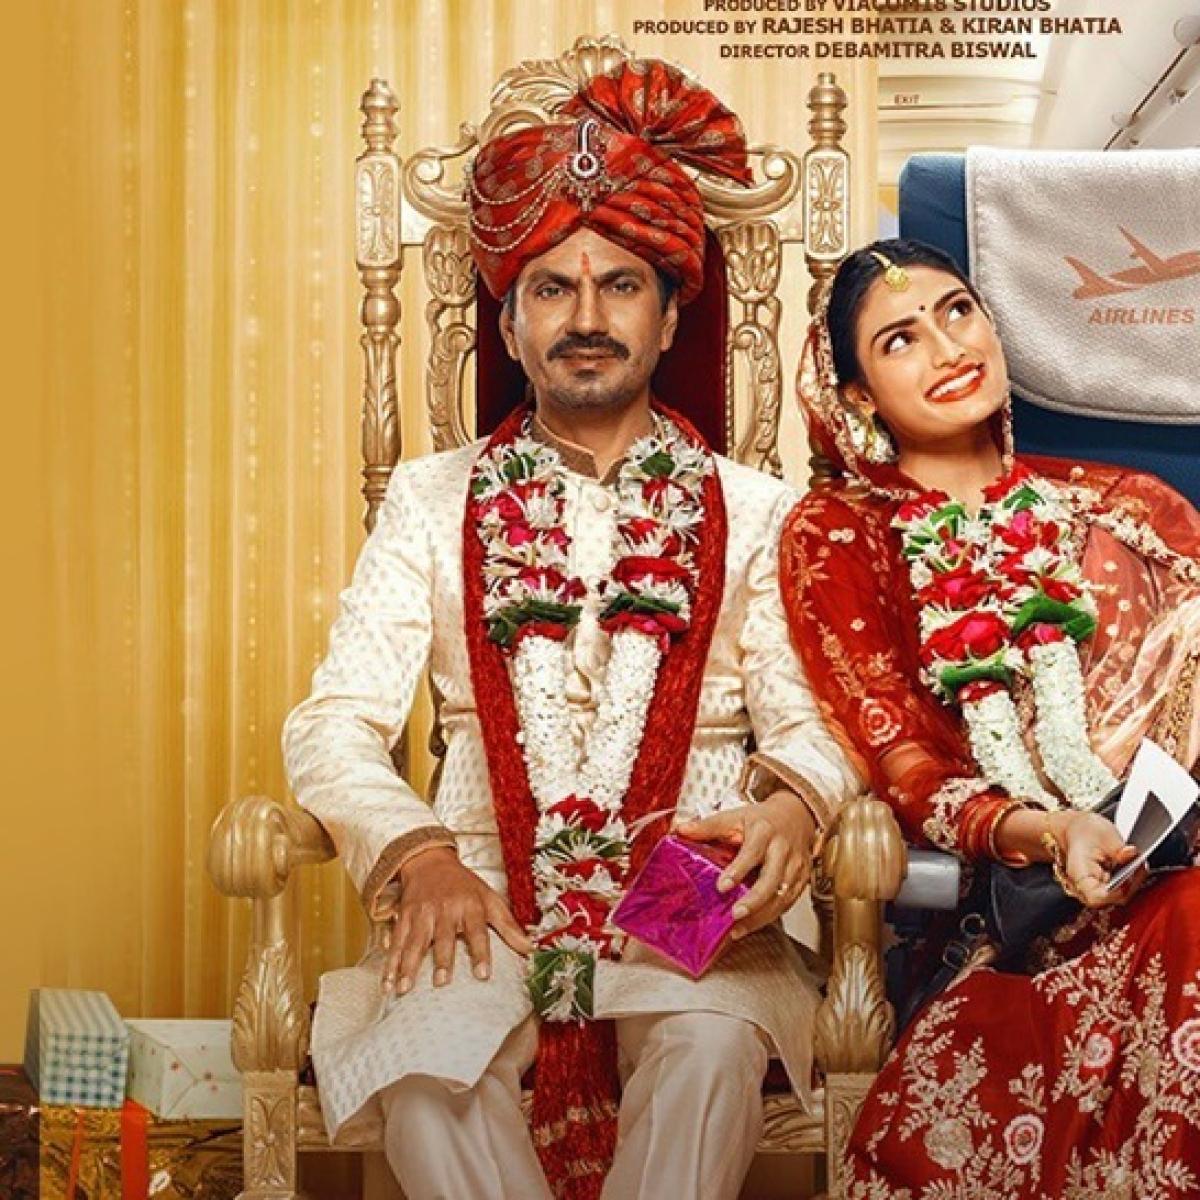 Motichoor Chaknachoor Movie Review: Humour caught in a time warp